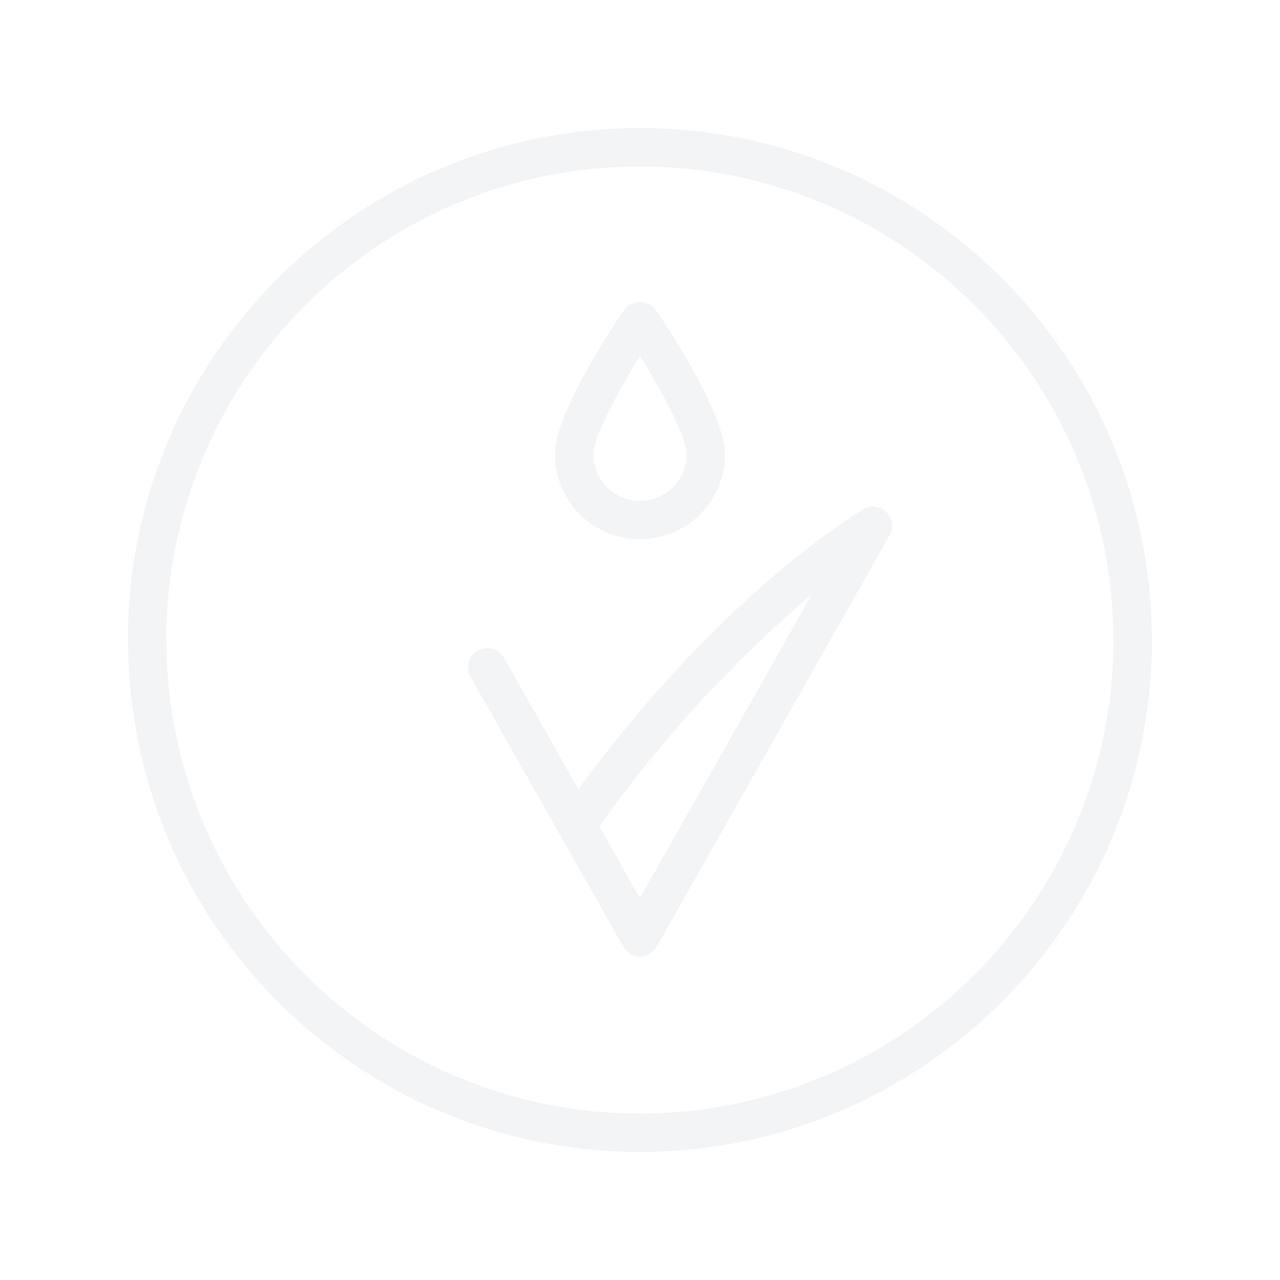 Clarins Multi-Active Night Revitalizing Cream (Normal/Dry) 50ml